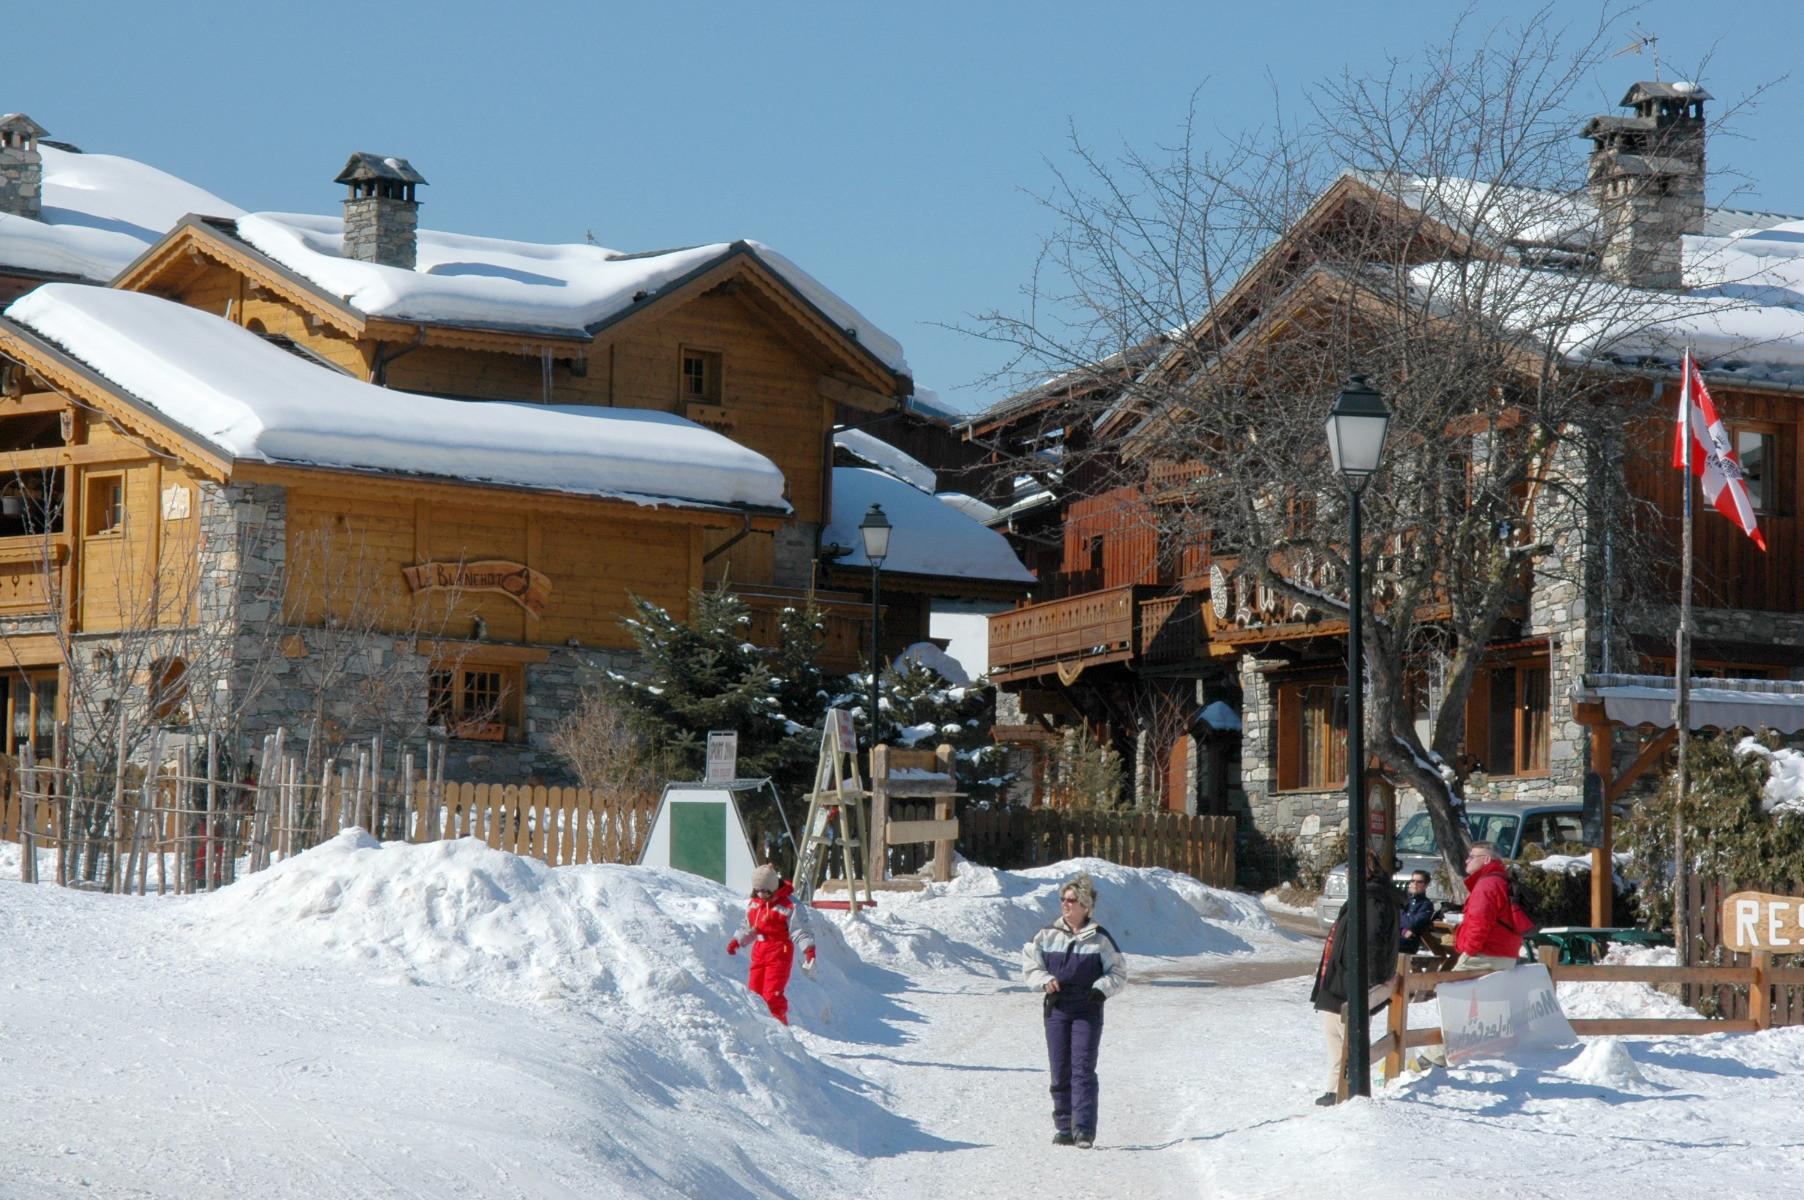 Montchavin La Plagne Ski Resort Montchavin La Plagne Snow